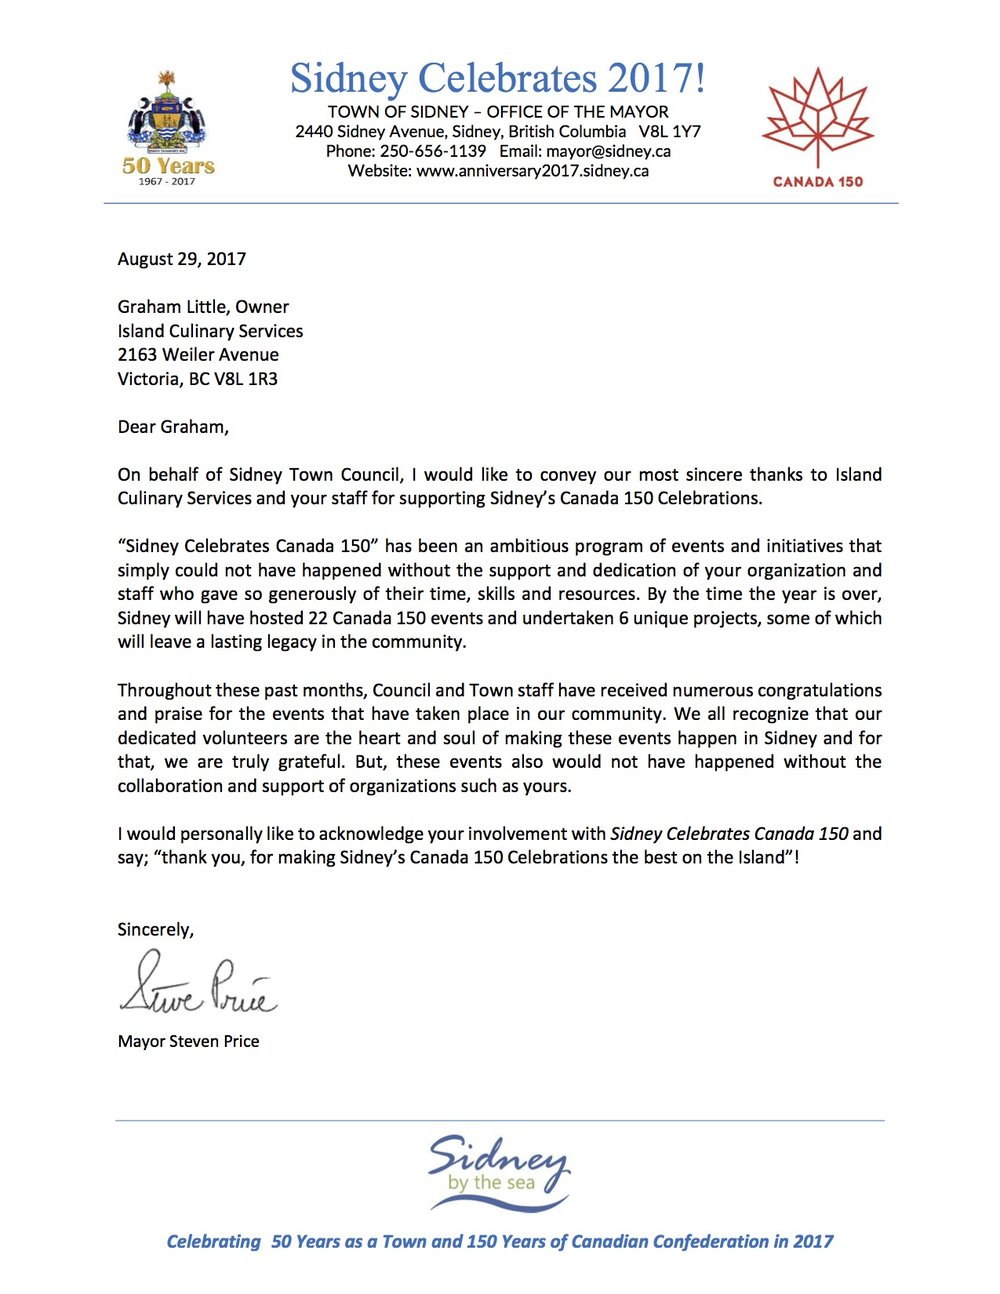 Canada 150 organization appreciation.jpg